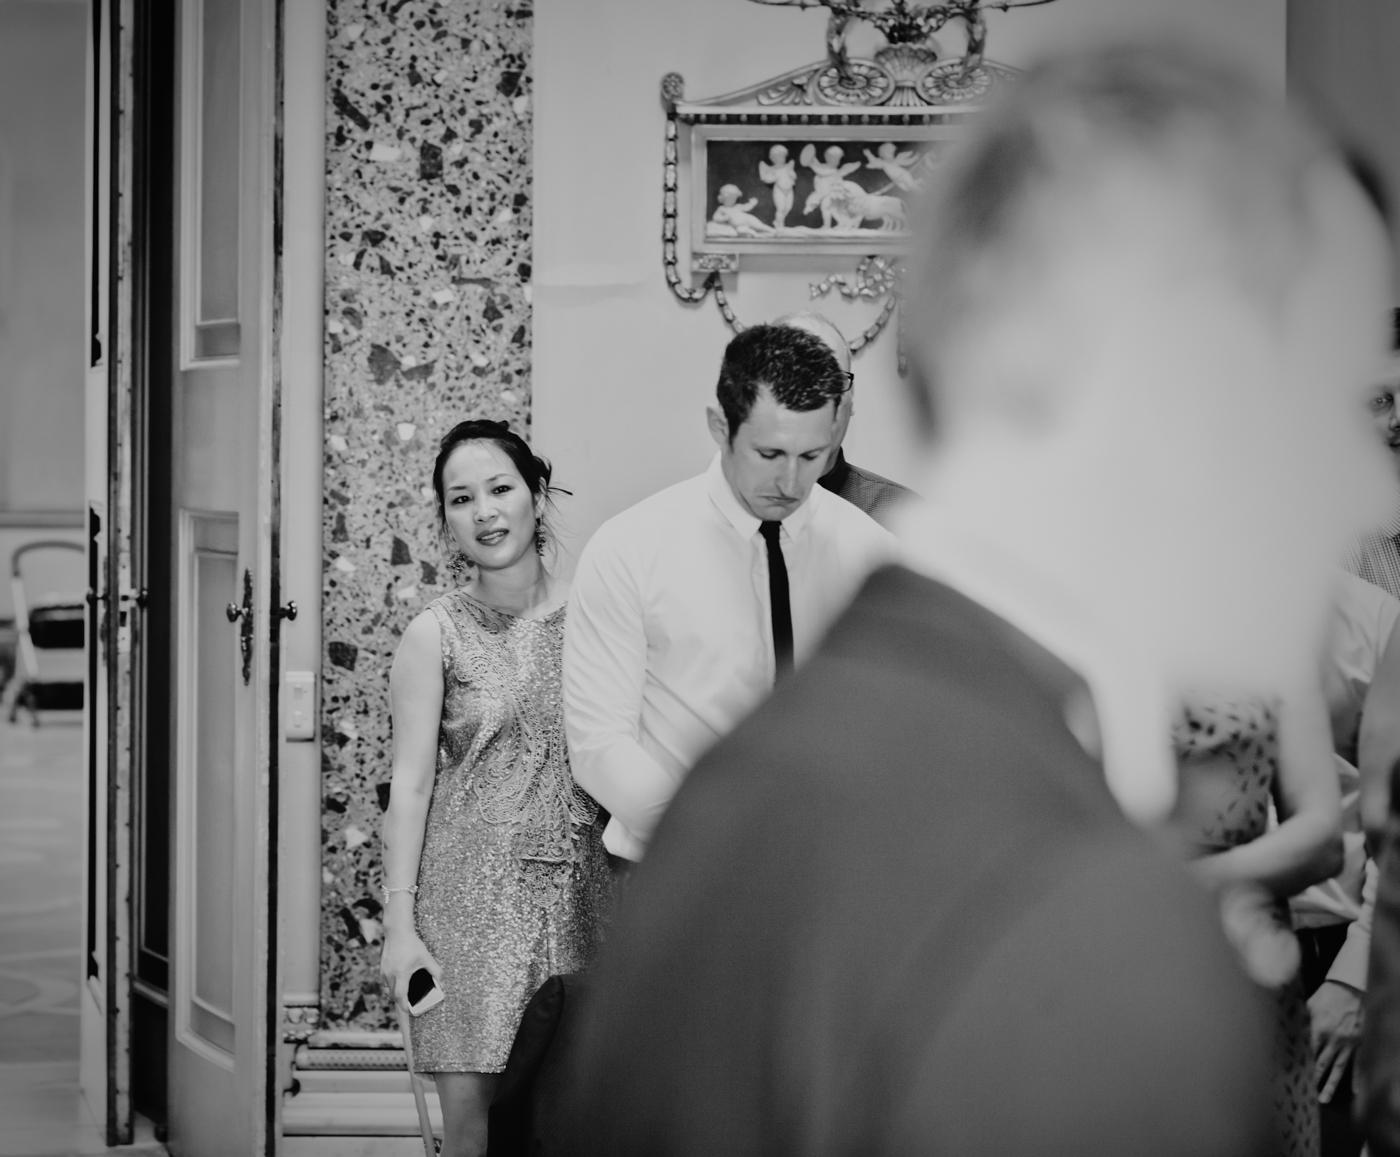 060 - Abi and Chris at Kedleston Hall - Wedding Photography by Mark Pugh www.markpugh.com - 0169.JPG